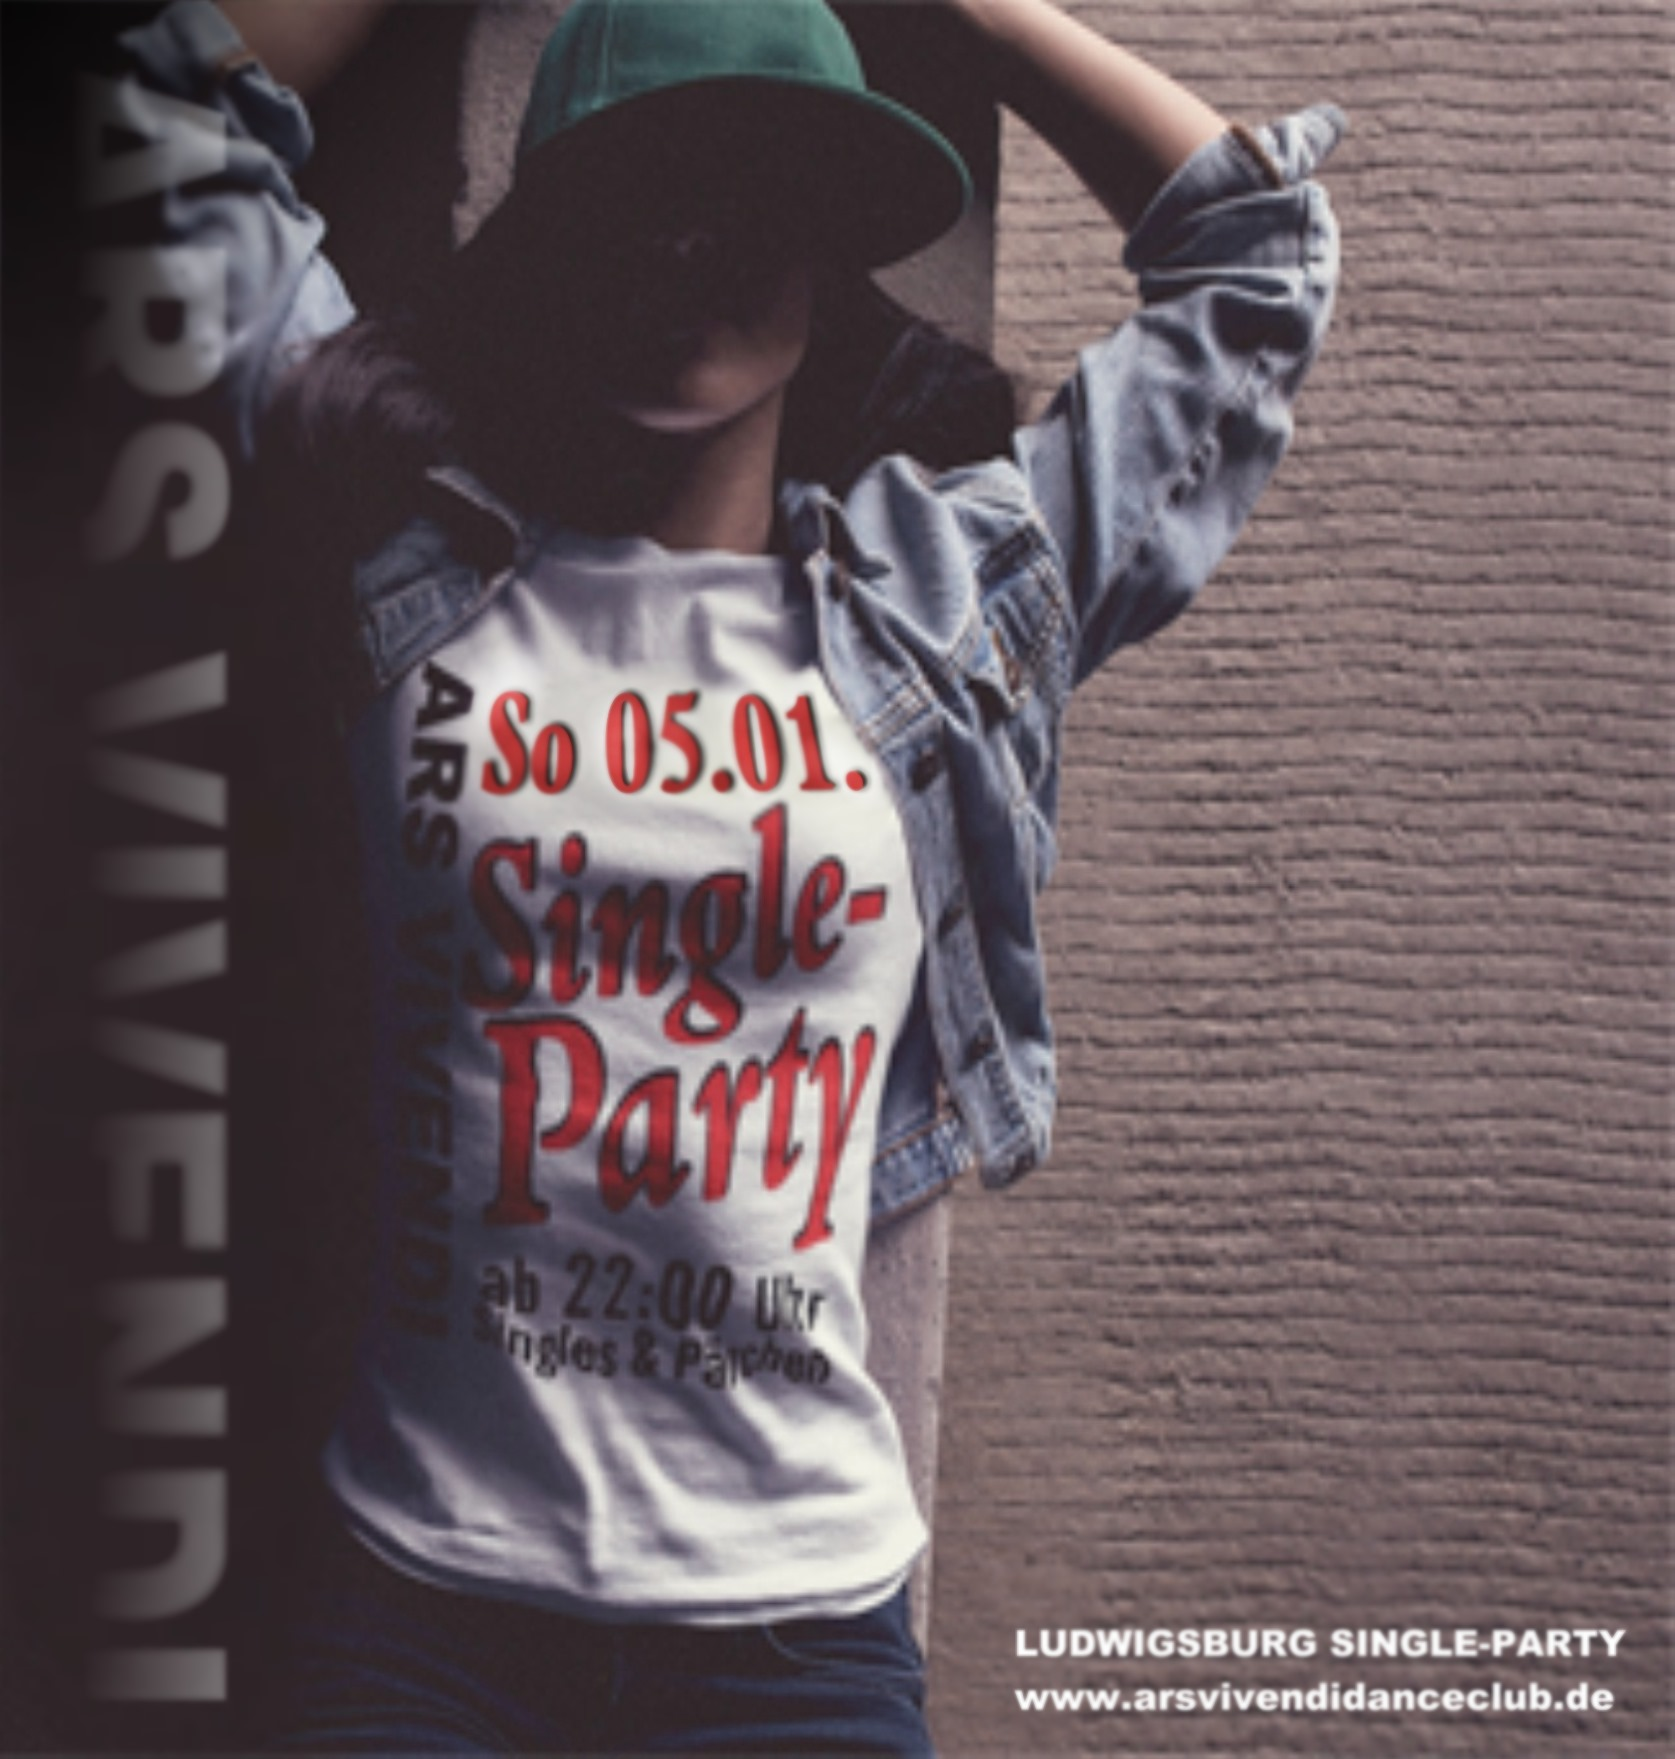 Tanzkurs für singles ludwigsburg